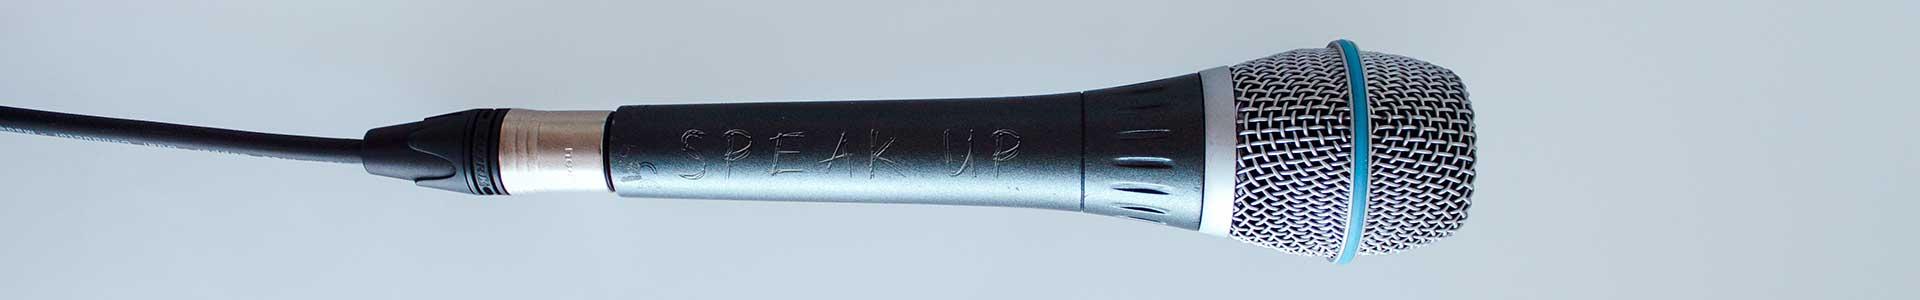 Mikrofon Close Up